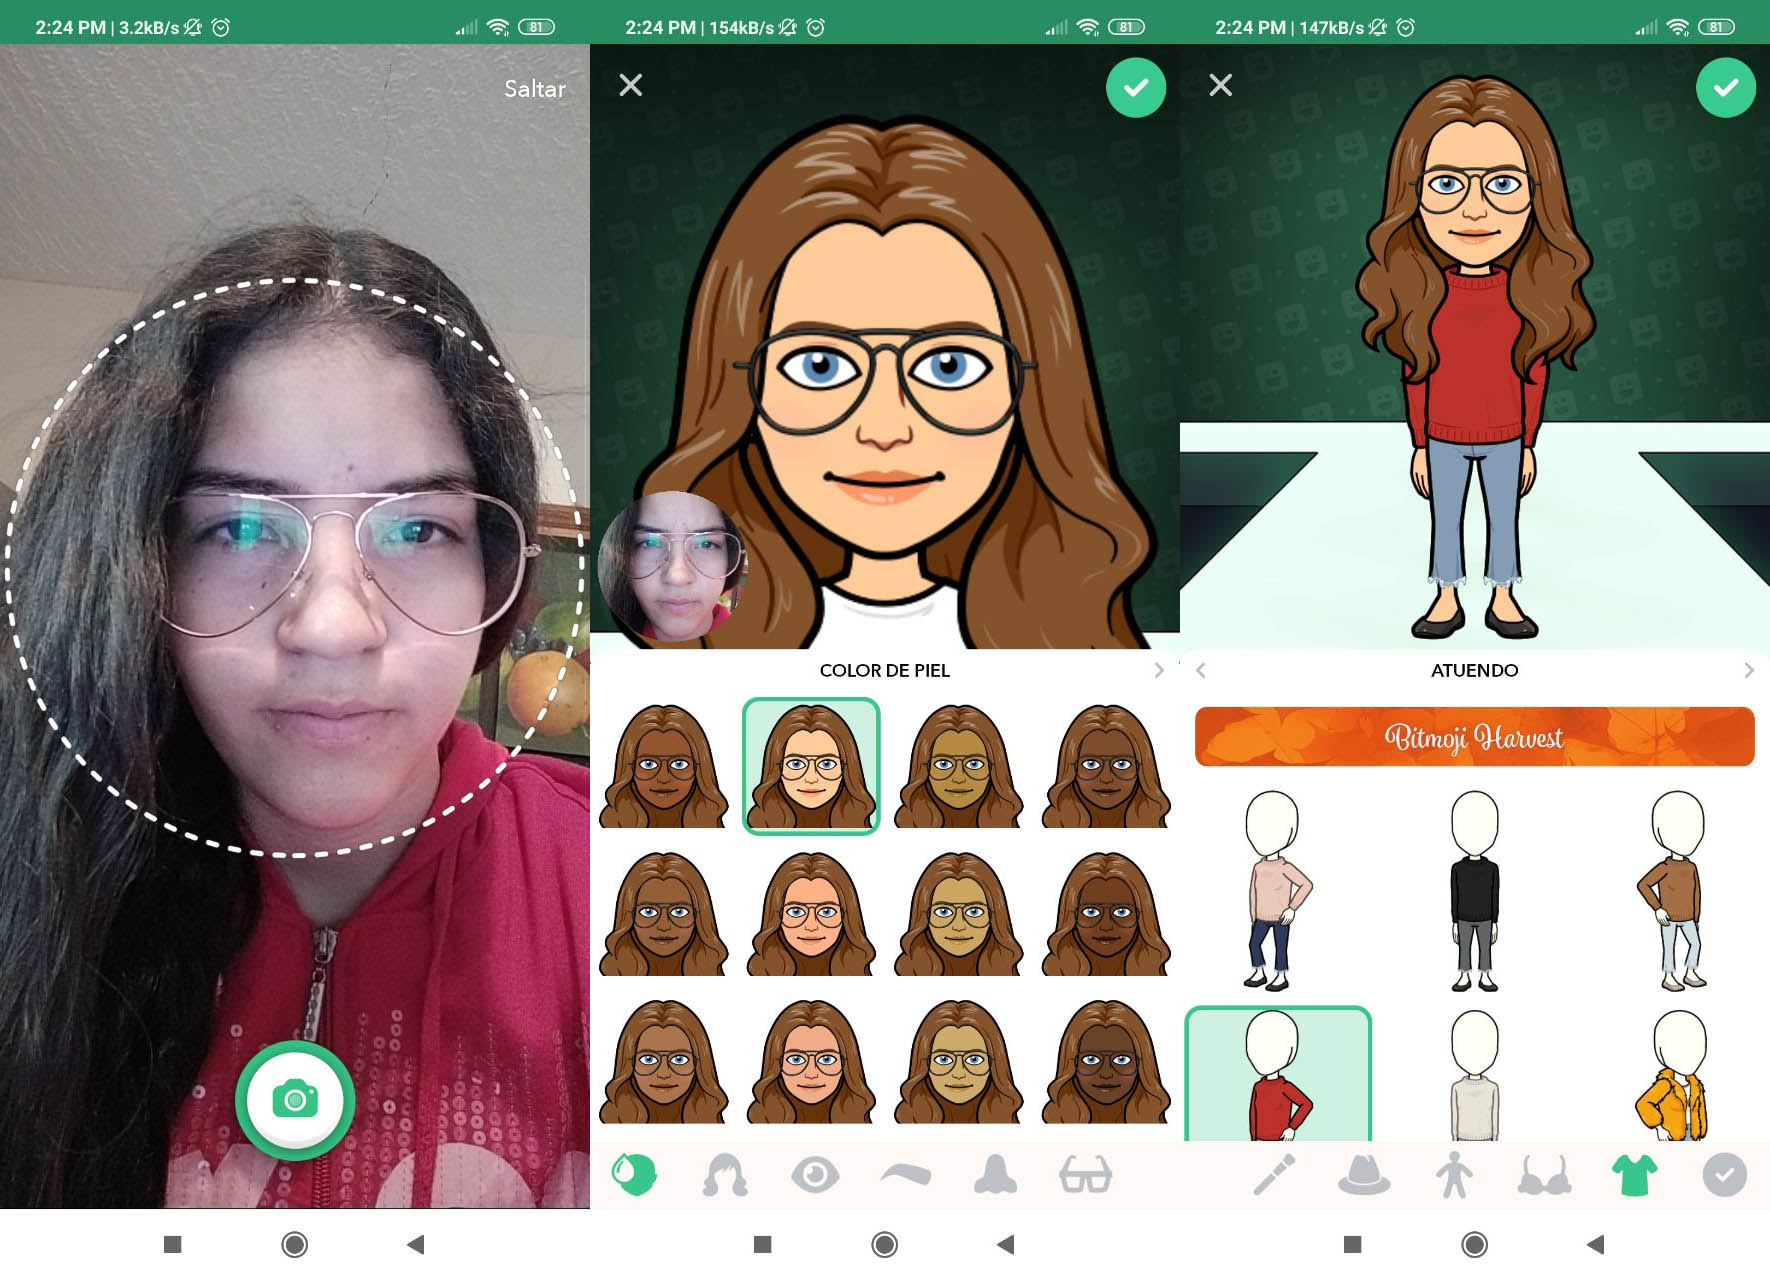 hacer emojis con Bitmoji